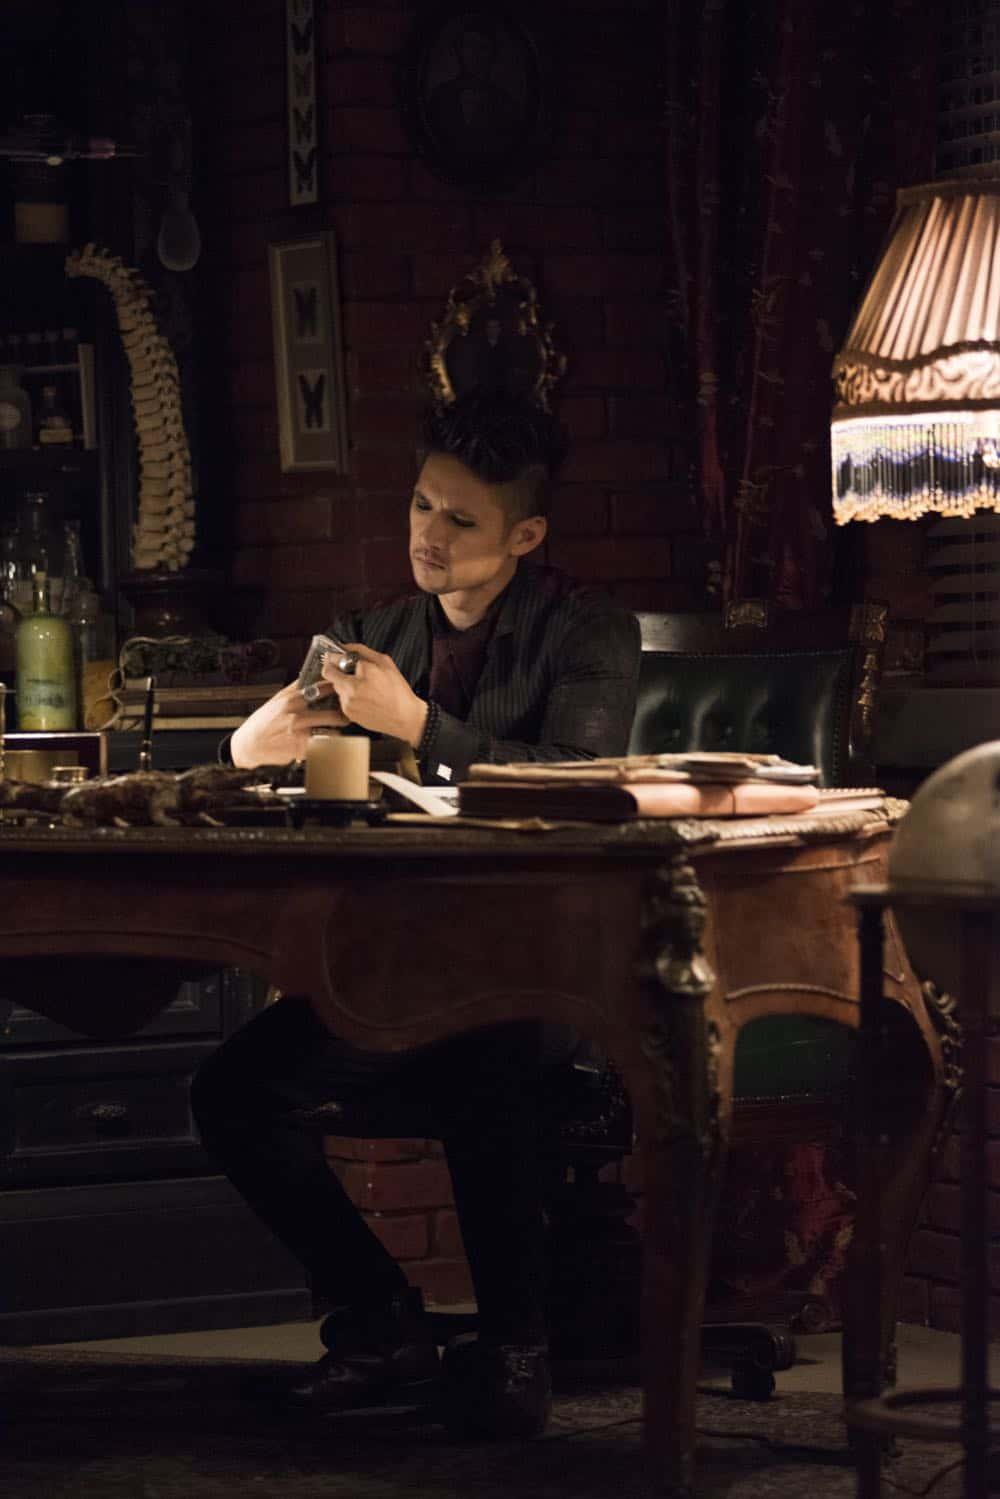 Shadowhunters Episode 5 Season 3 Stronger Than Heaven 35